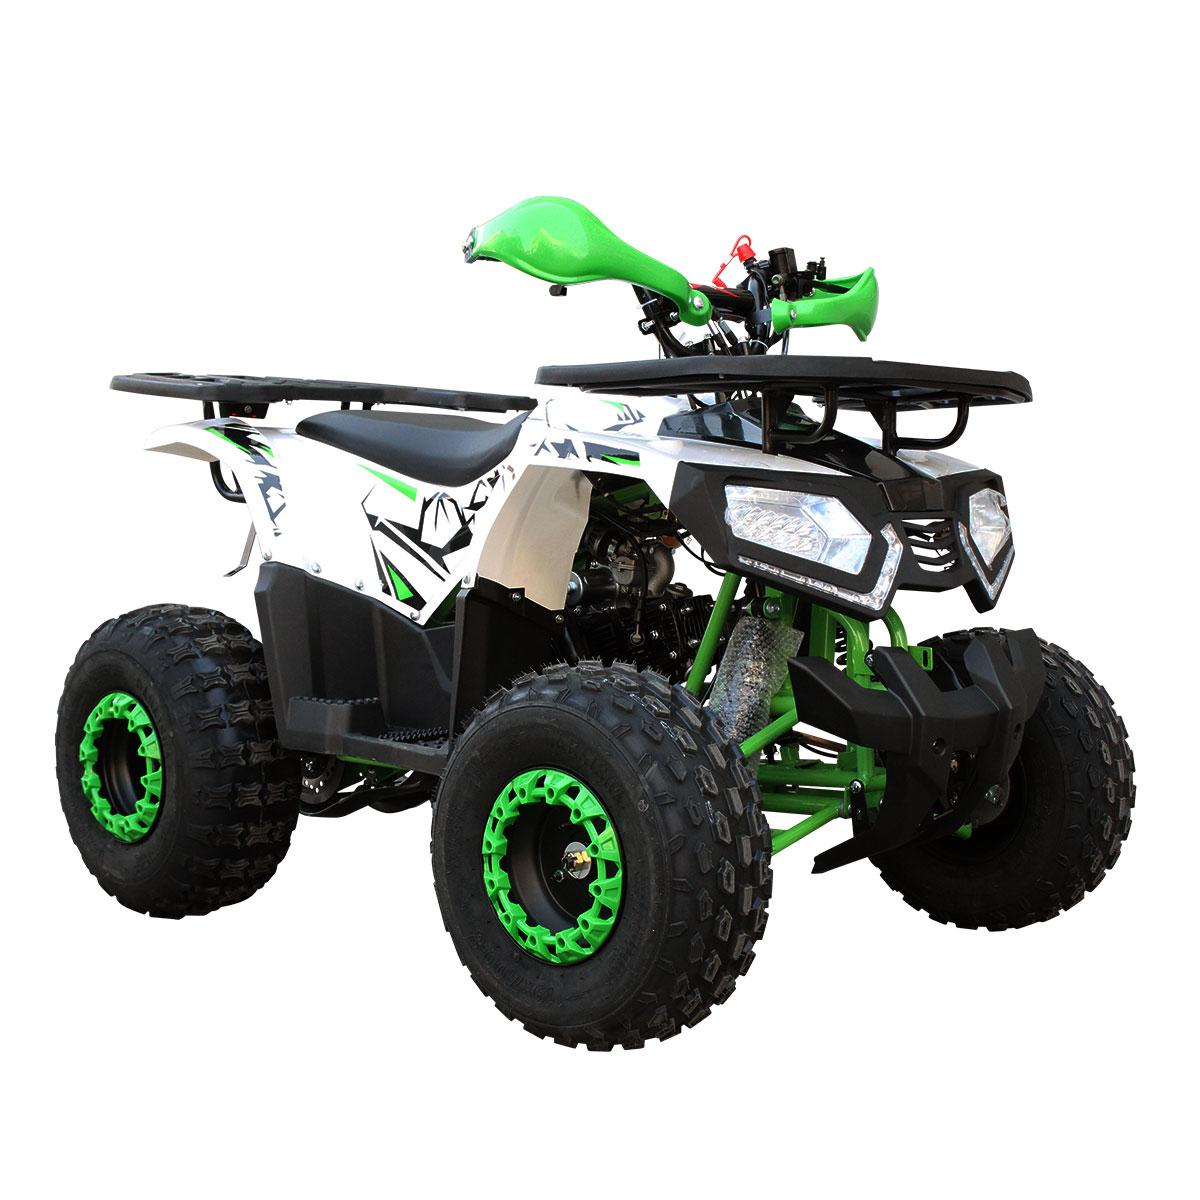 ATV X-PRO Mud 110cc